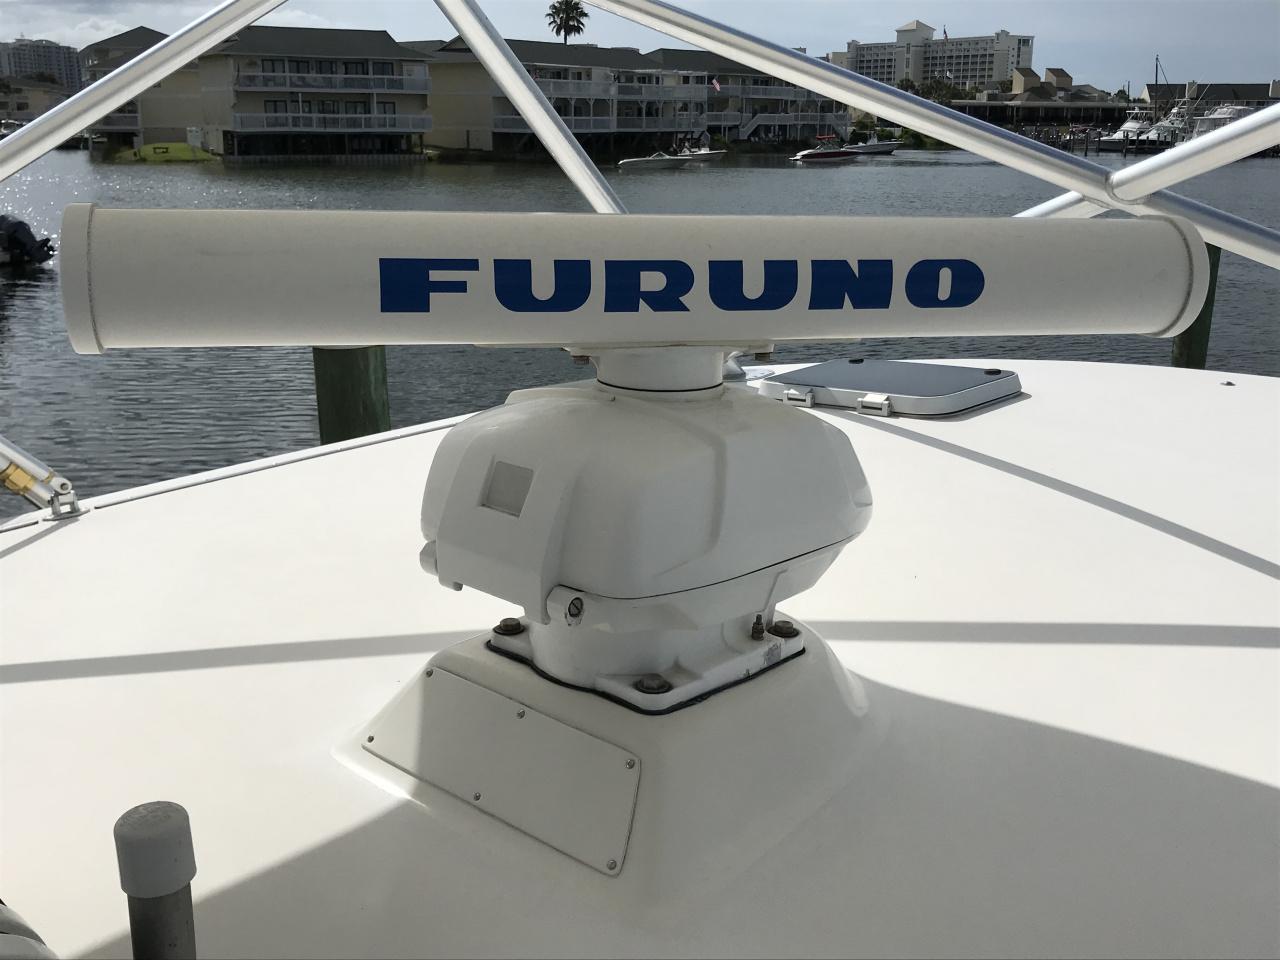 5 Furuno 6kw 4' Open Array Radar + Display + Cable-img_7635-jpg